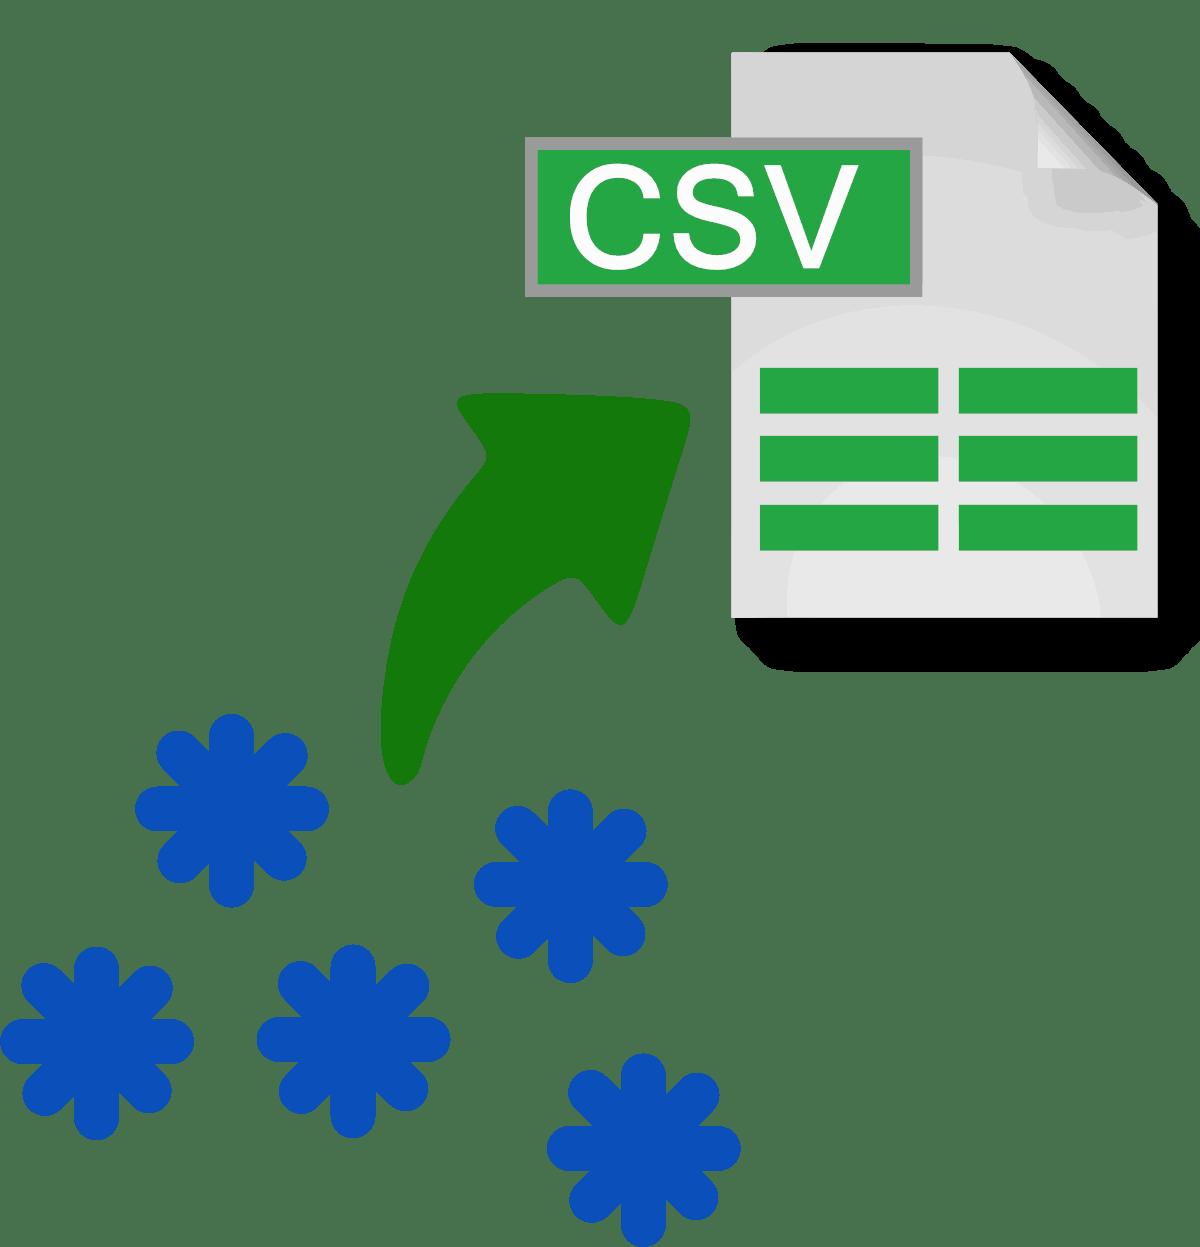 Vba Macro To Export Sketch Point Coordinates To Csv File